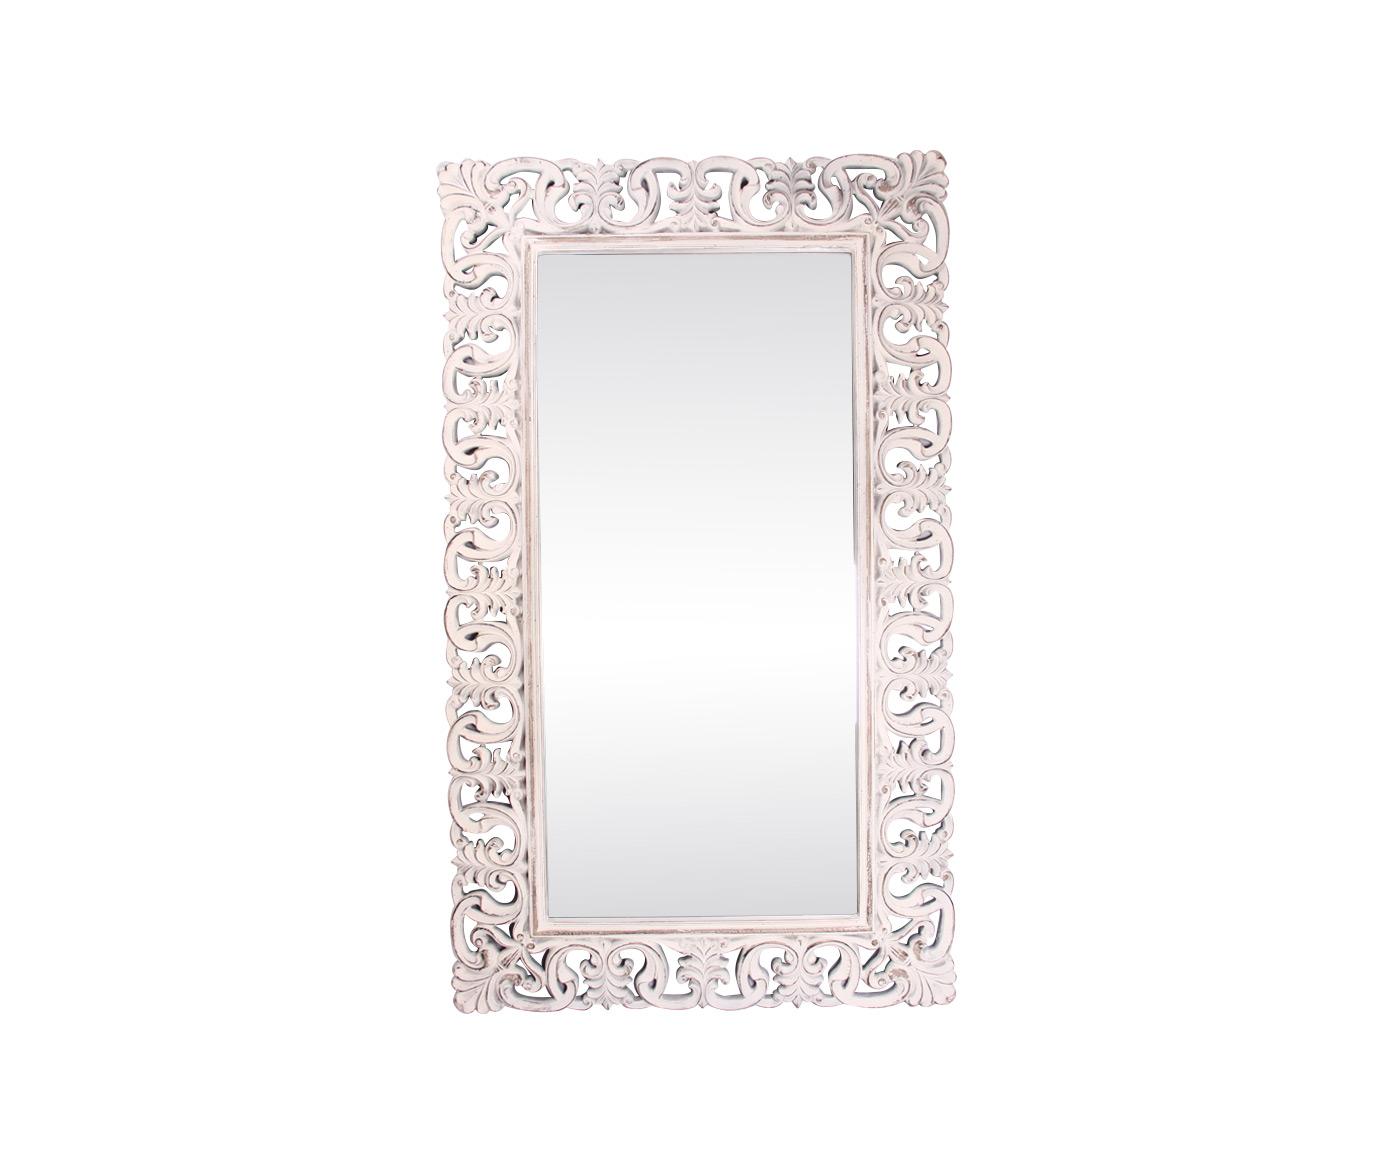 ЗеркалоНапольные зеркала<br><br><br>Material: Полистоун<br>Width см: 121<br>Depth см: 7,5<br>Height см: 206